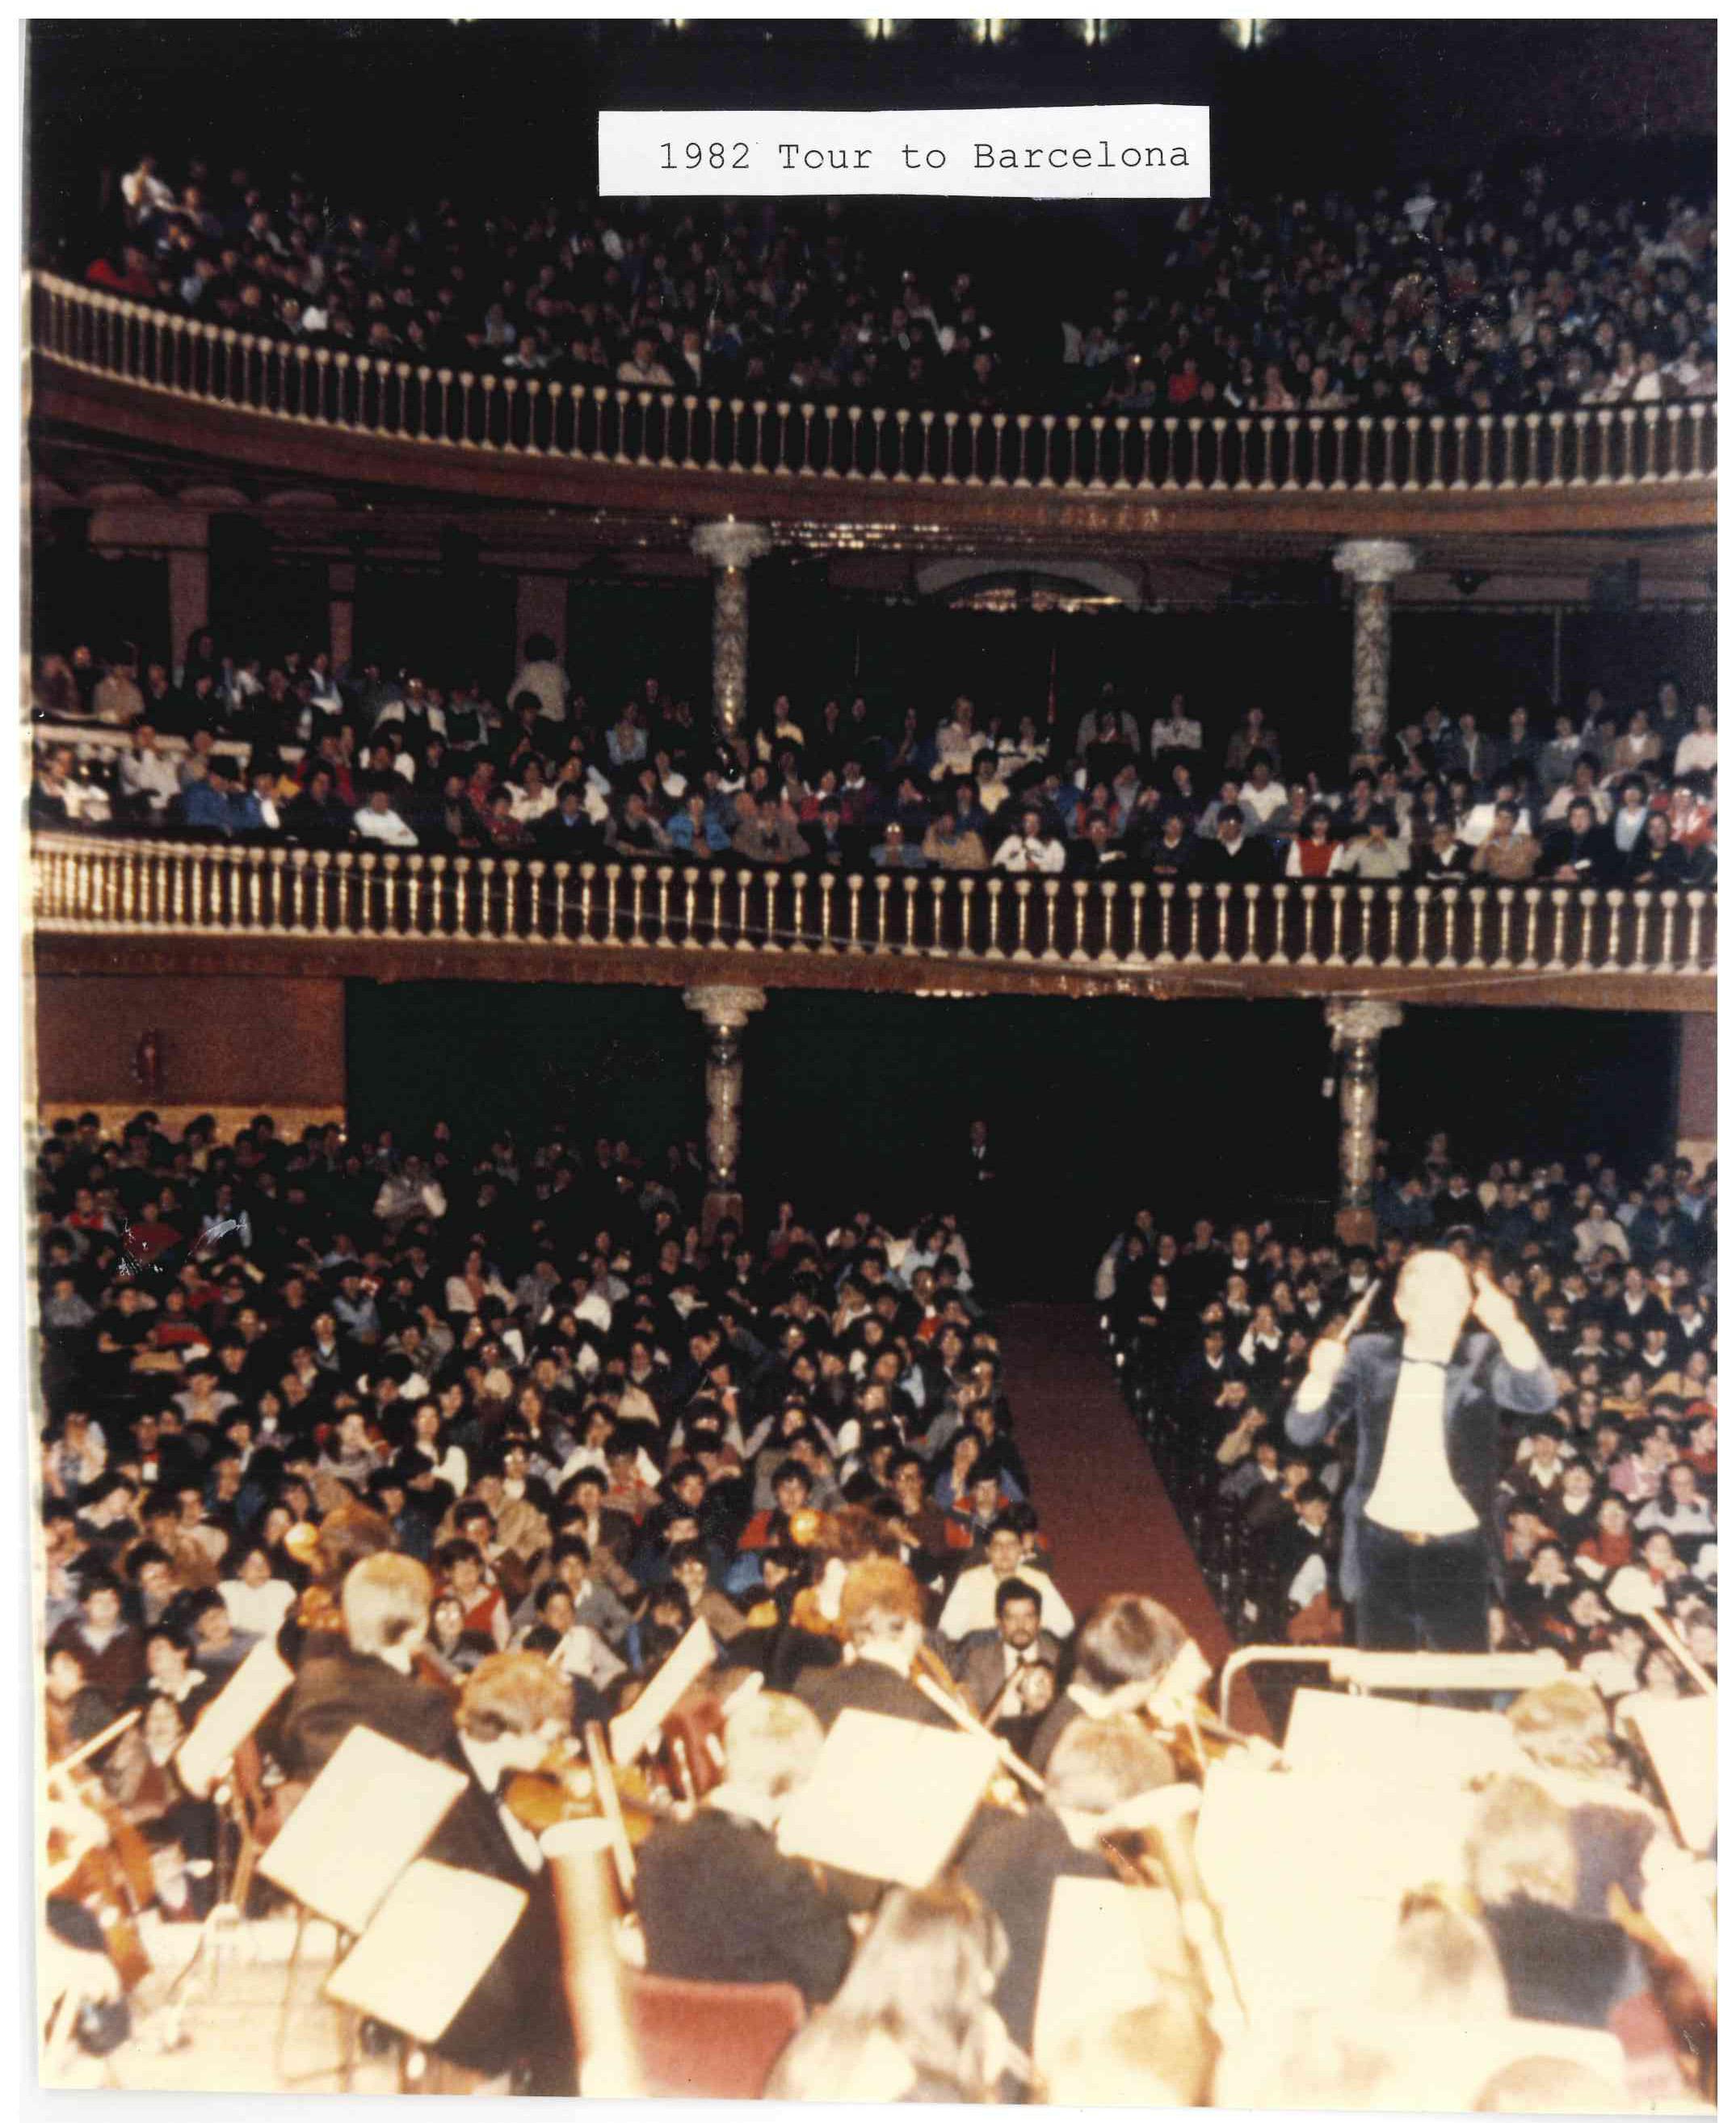 00143-Barcalona Palau De La Musica, 1982.jpg